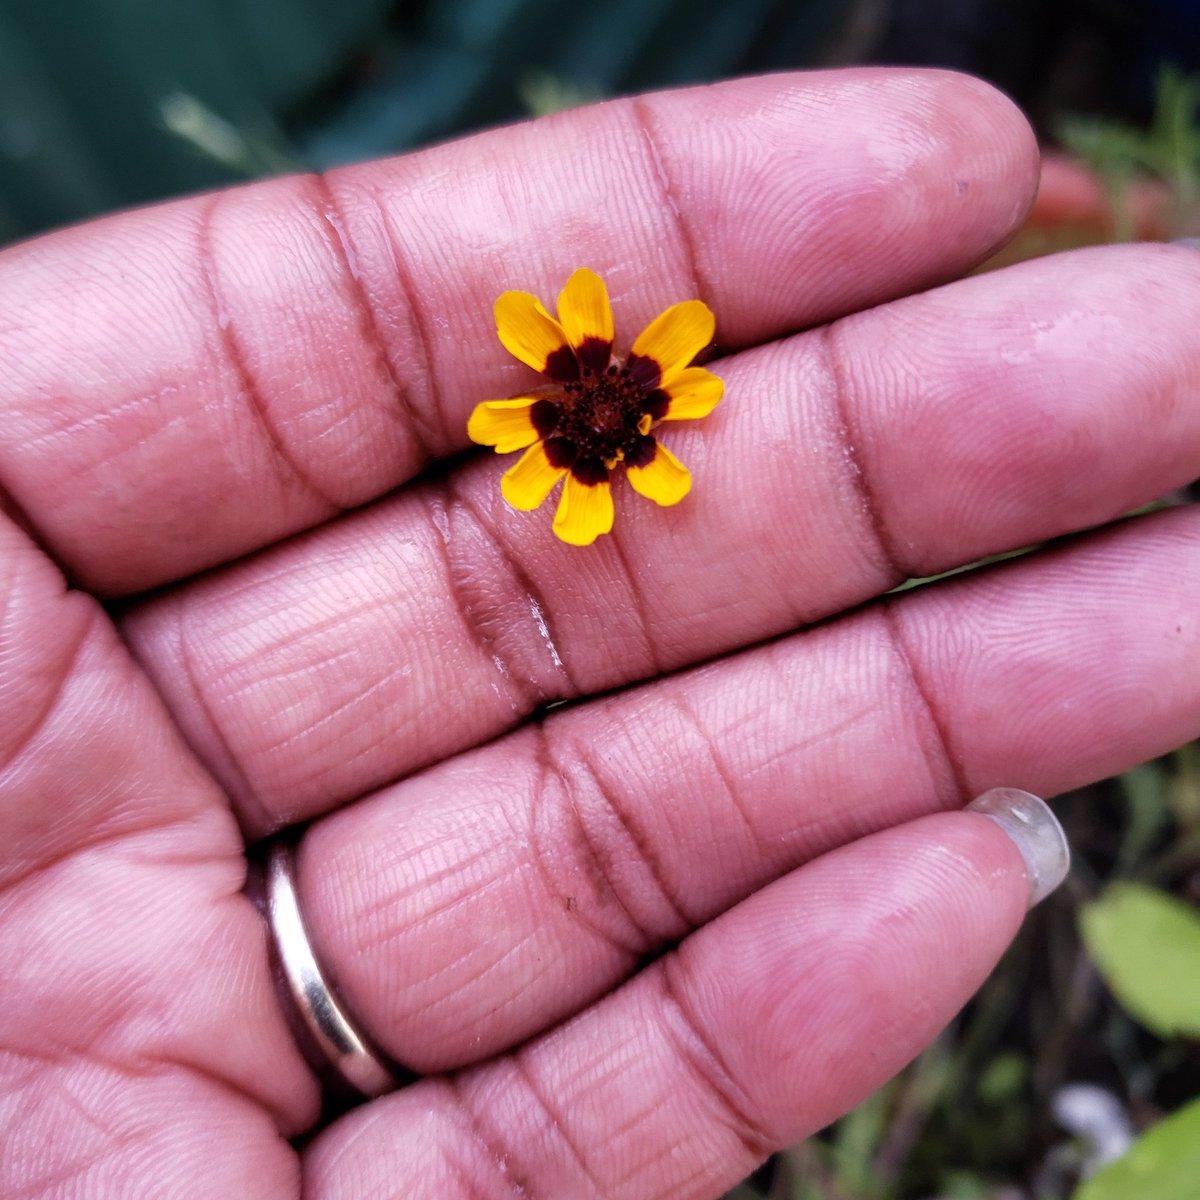 The first flower from my butterfly garden seeds.....it's the little things #butterflygarden #flowers #stilllearning https://t.co/qqhW77hpjk